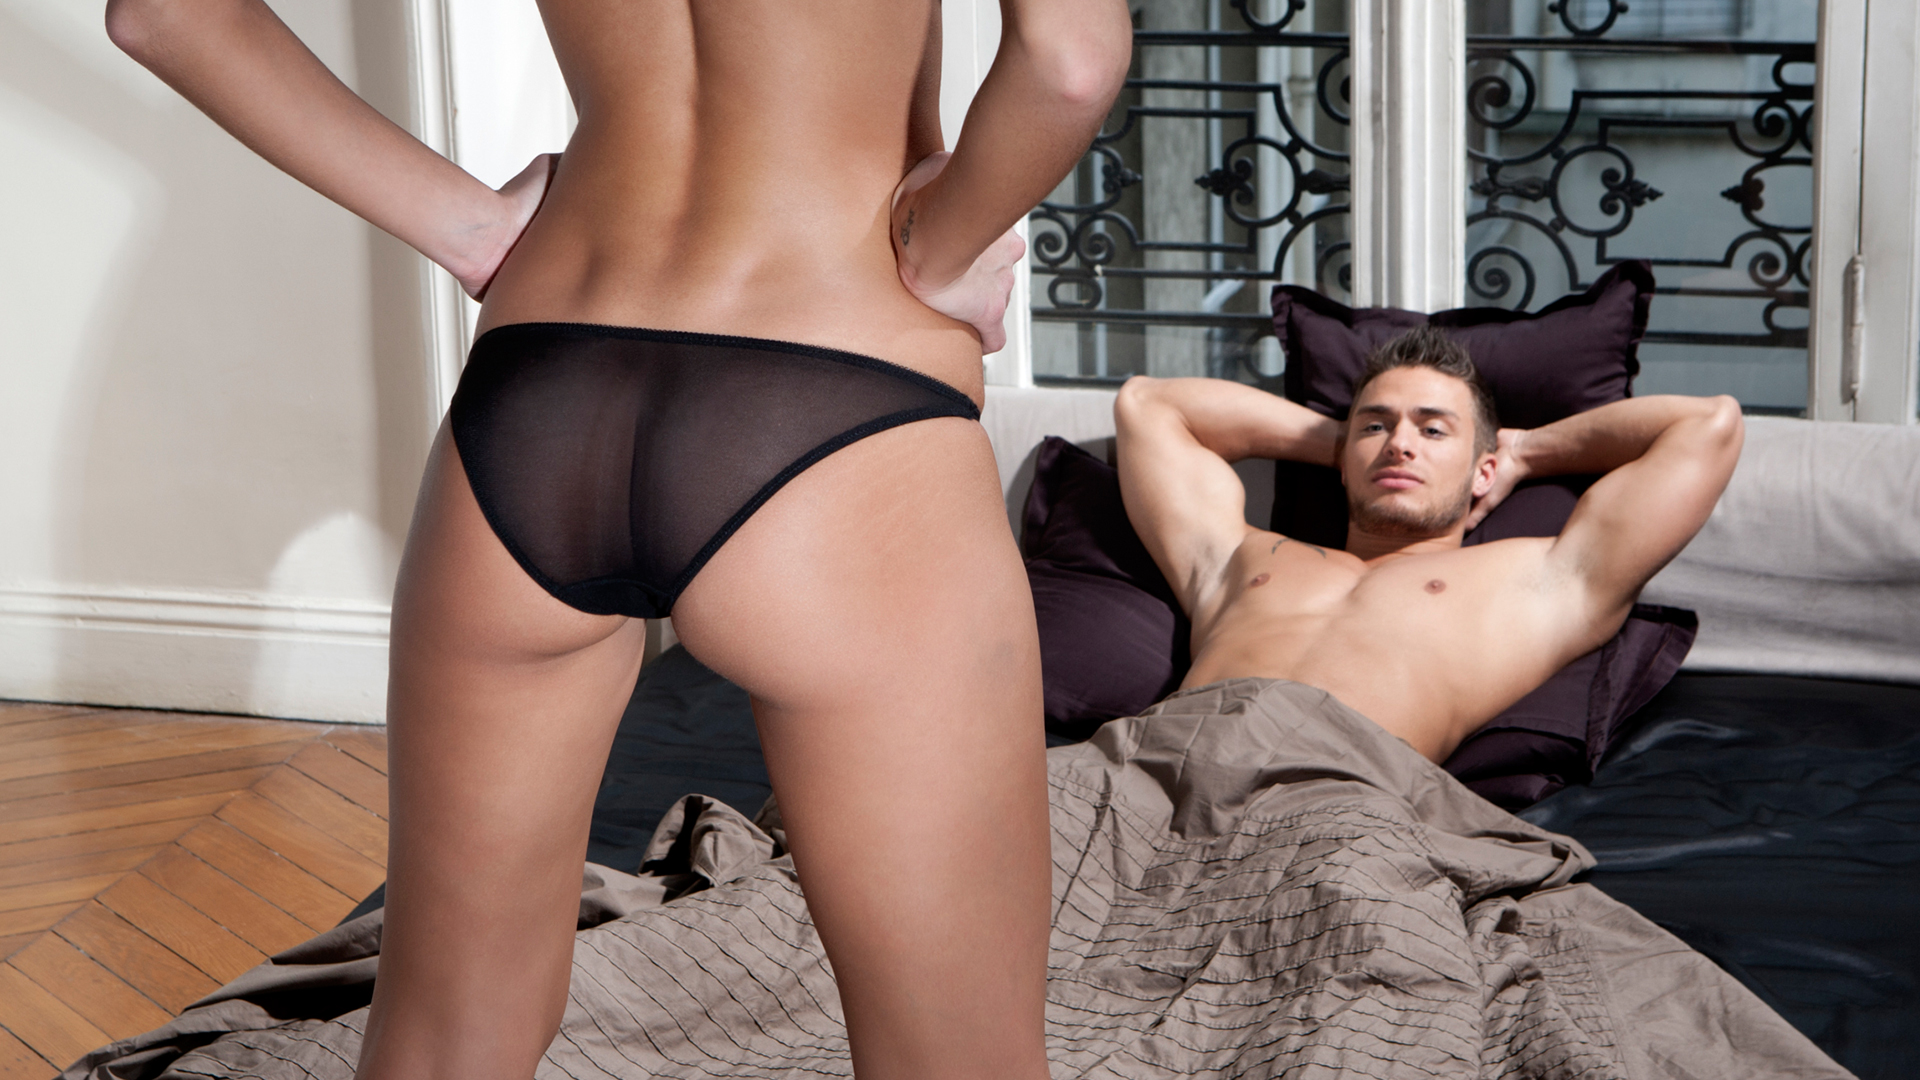 Man watching woman in underwear | Sheknows.ca